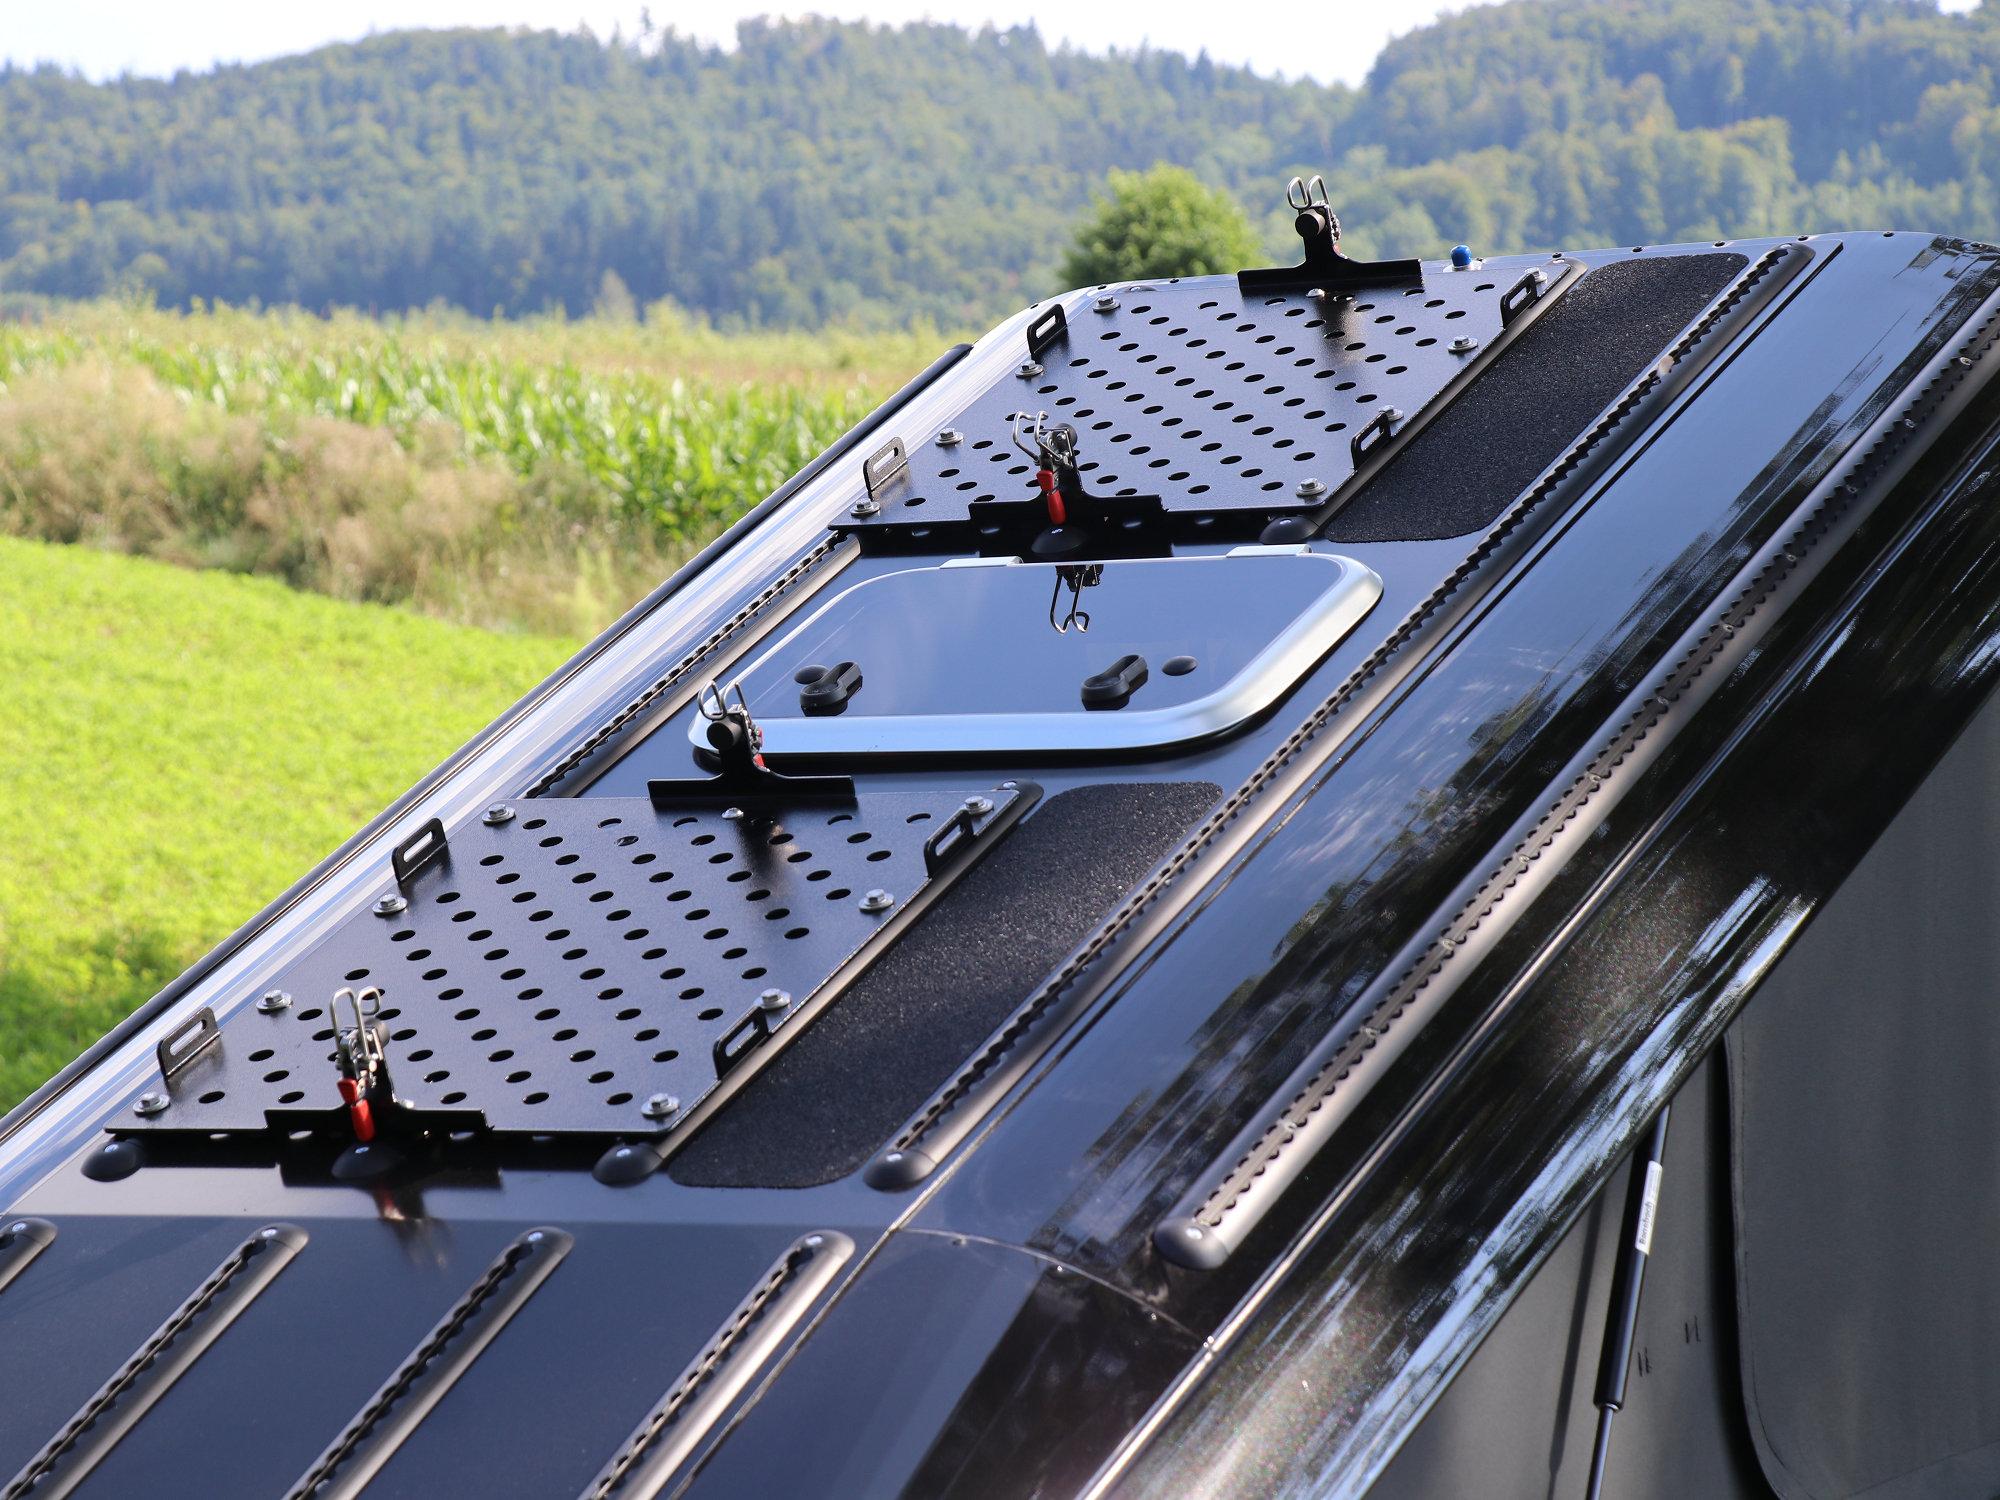 Dachgepaecktraeger Land Rover Defender.001